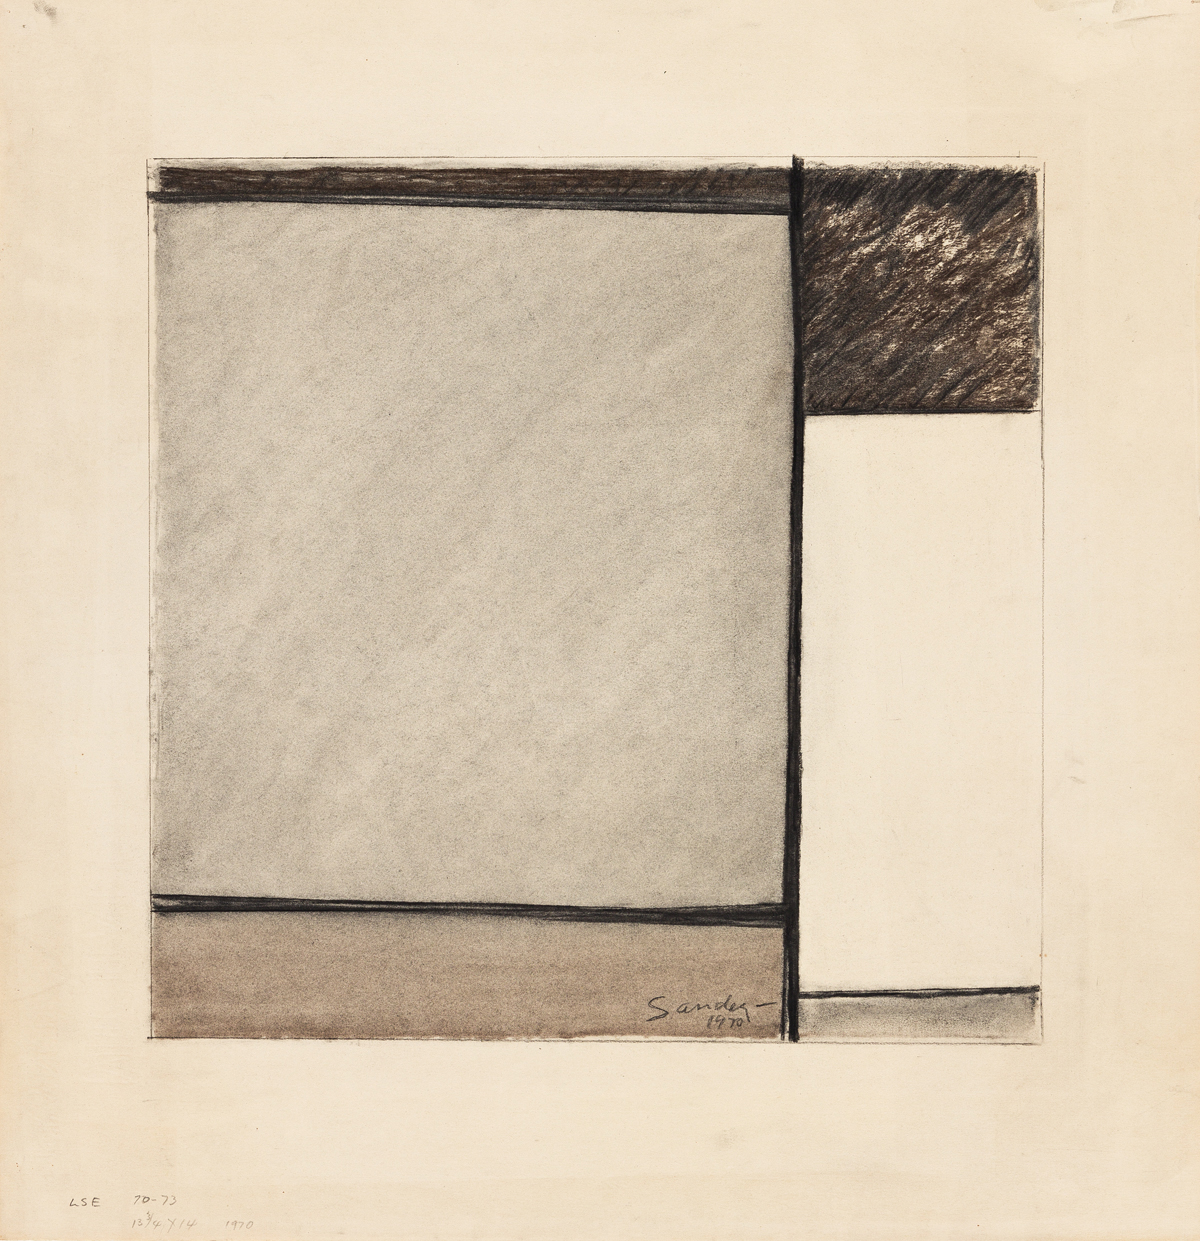 LUDWIG SANDER (1906 - 1975, AMERICAN) Untitled.